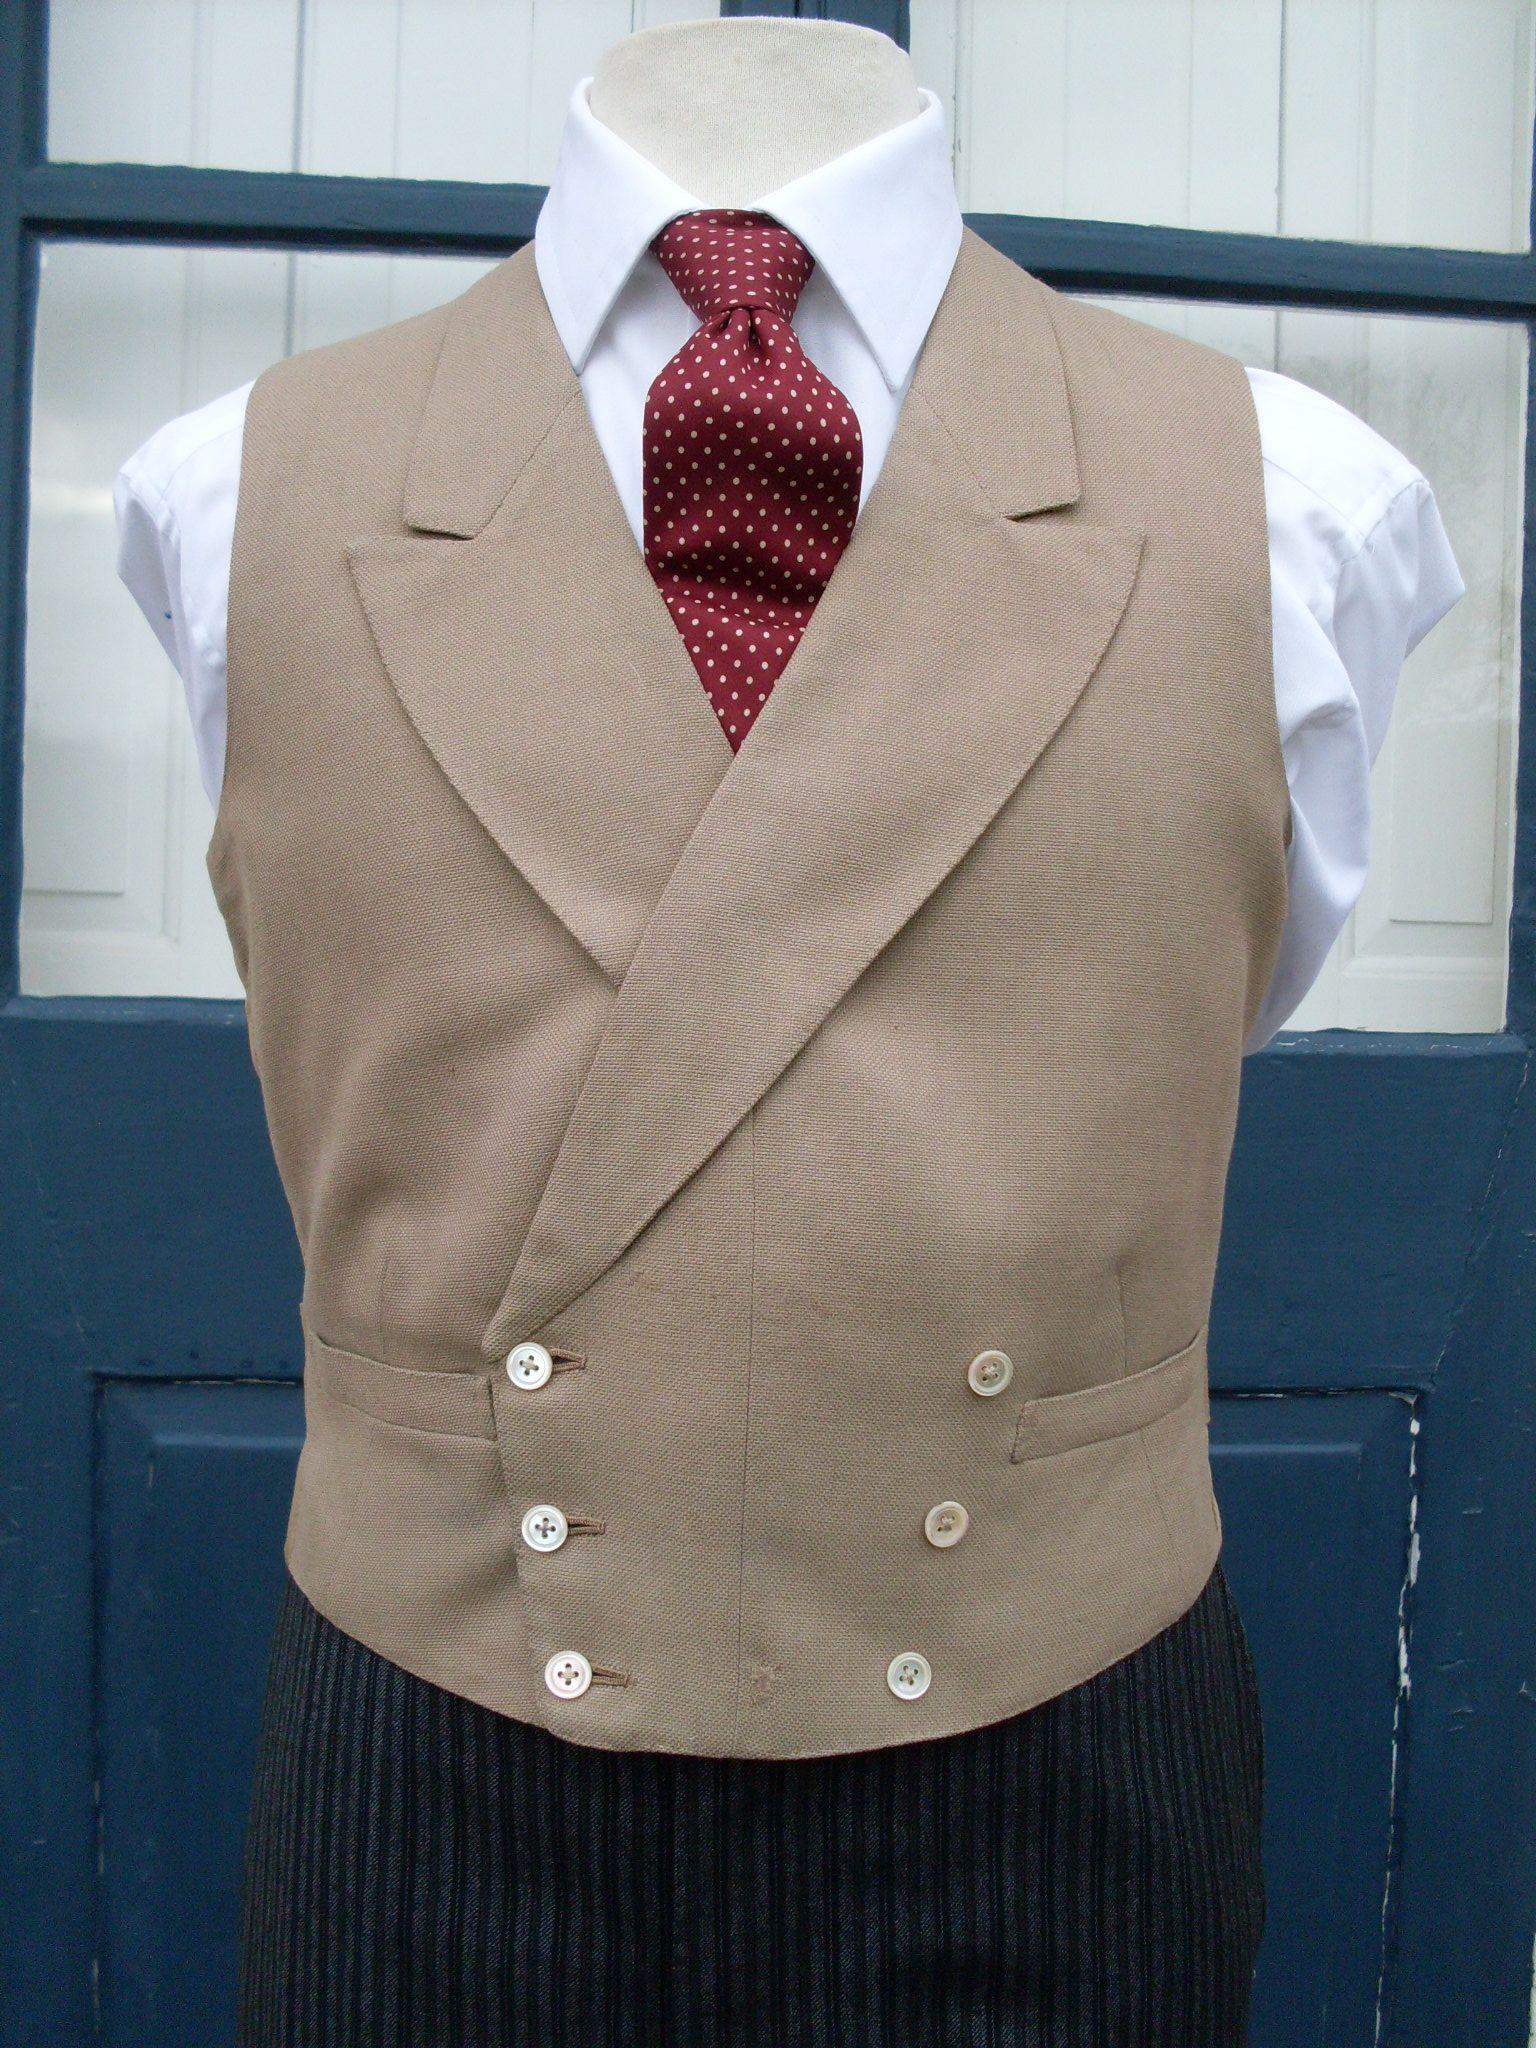 Waistcoats | Andrews & Pygott: The Morning Dress Guide